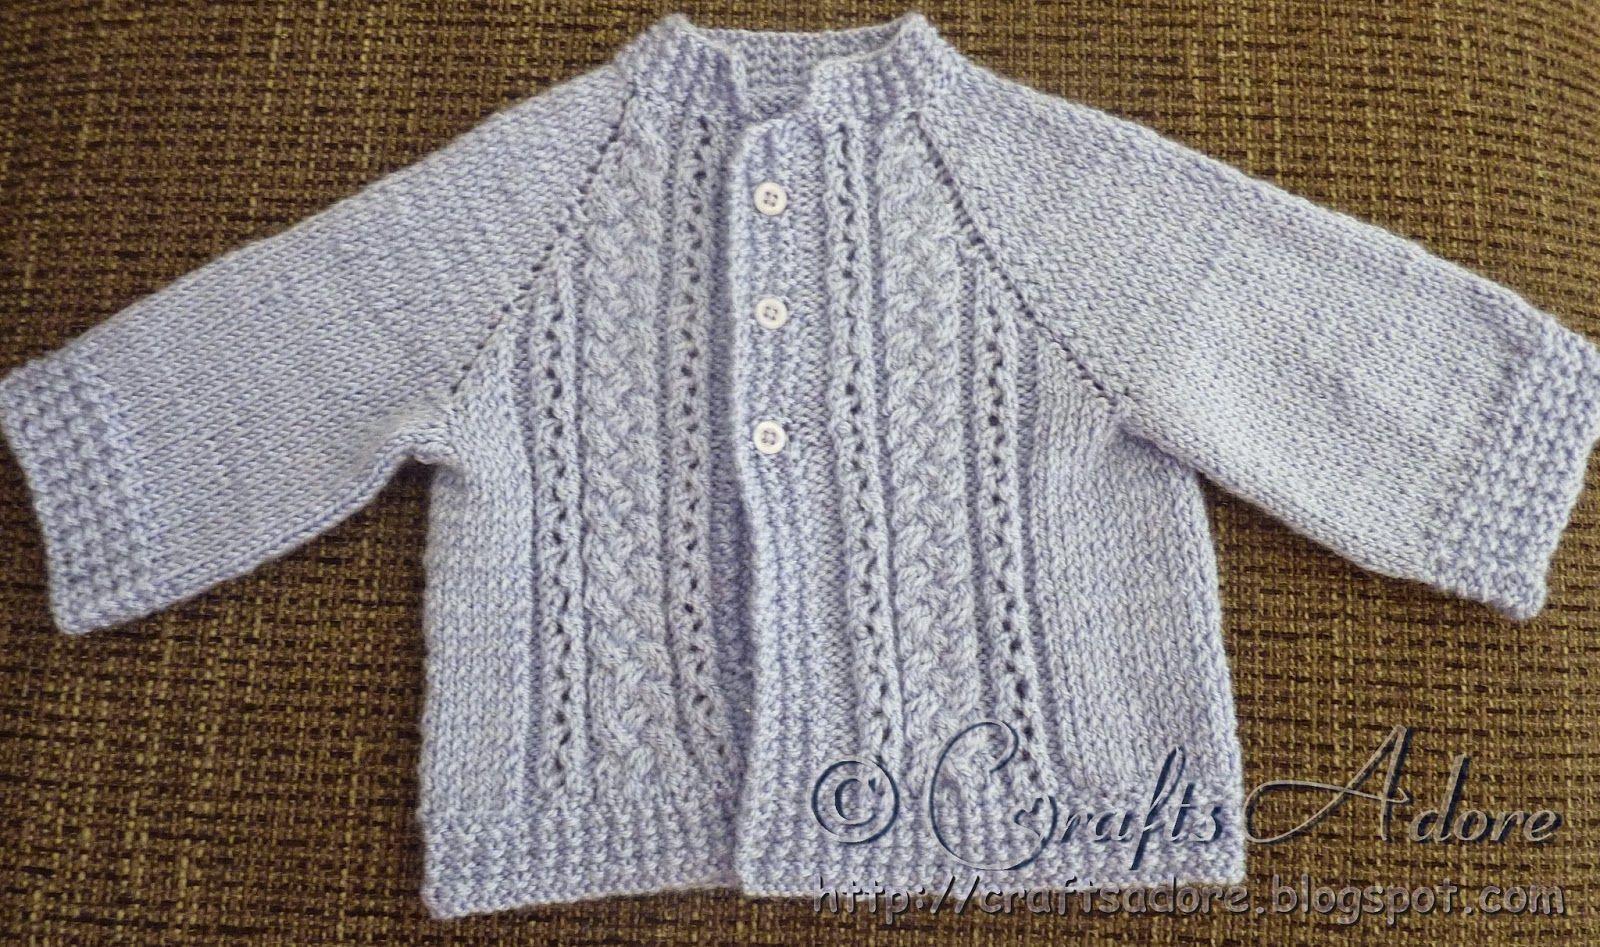 Knitted Baby Boy Cardigan Free Pattern | Knit, Crochet, Etc ...